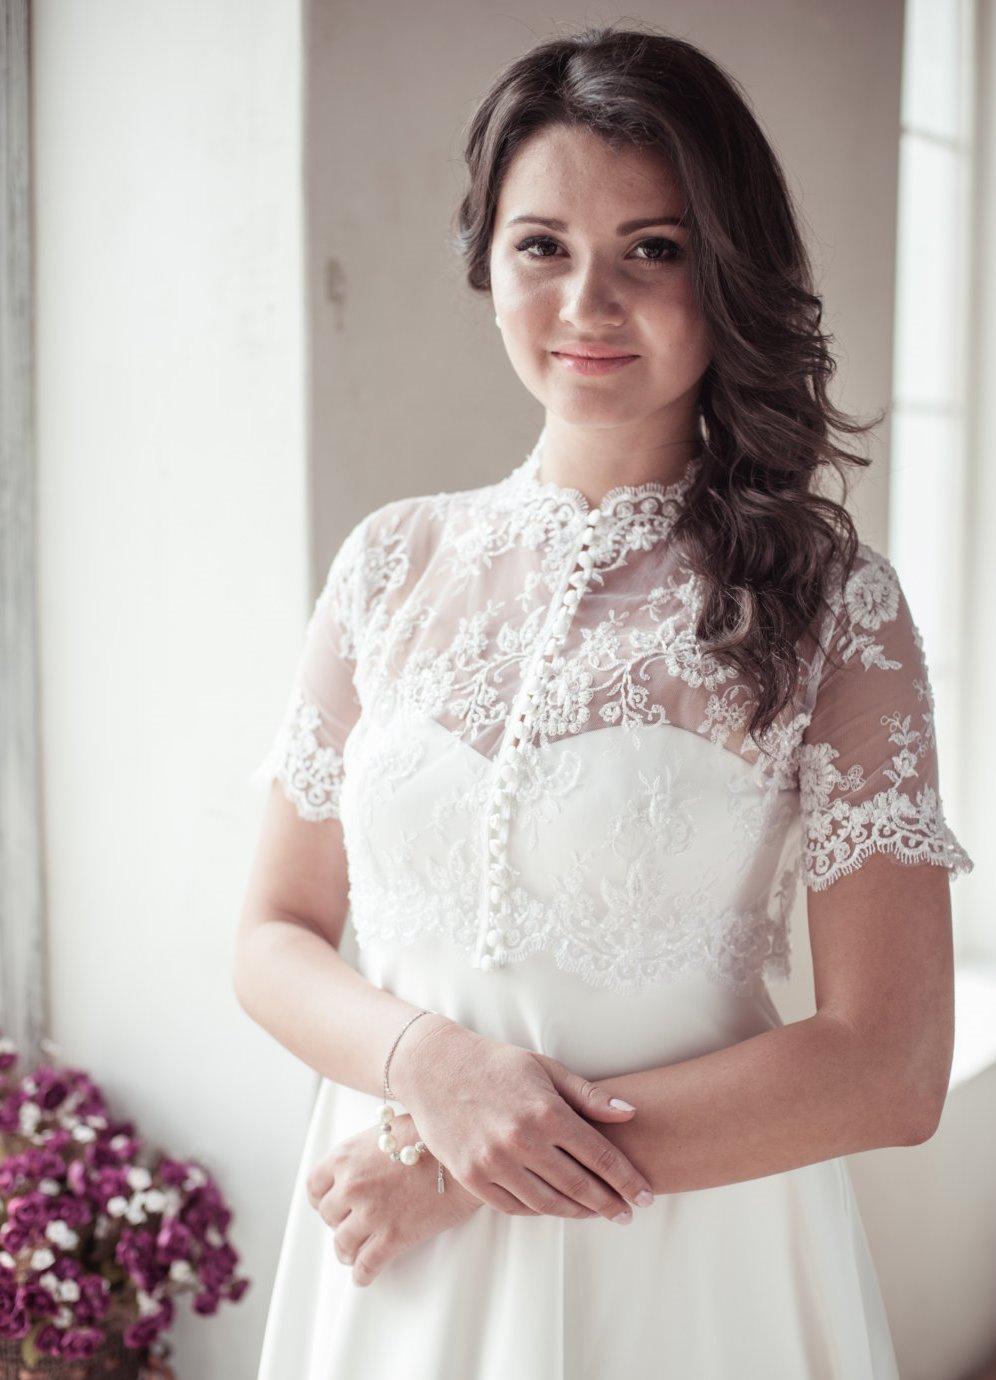 Болеро накидка на платье фото